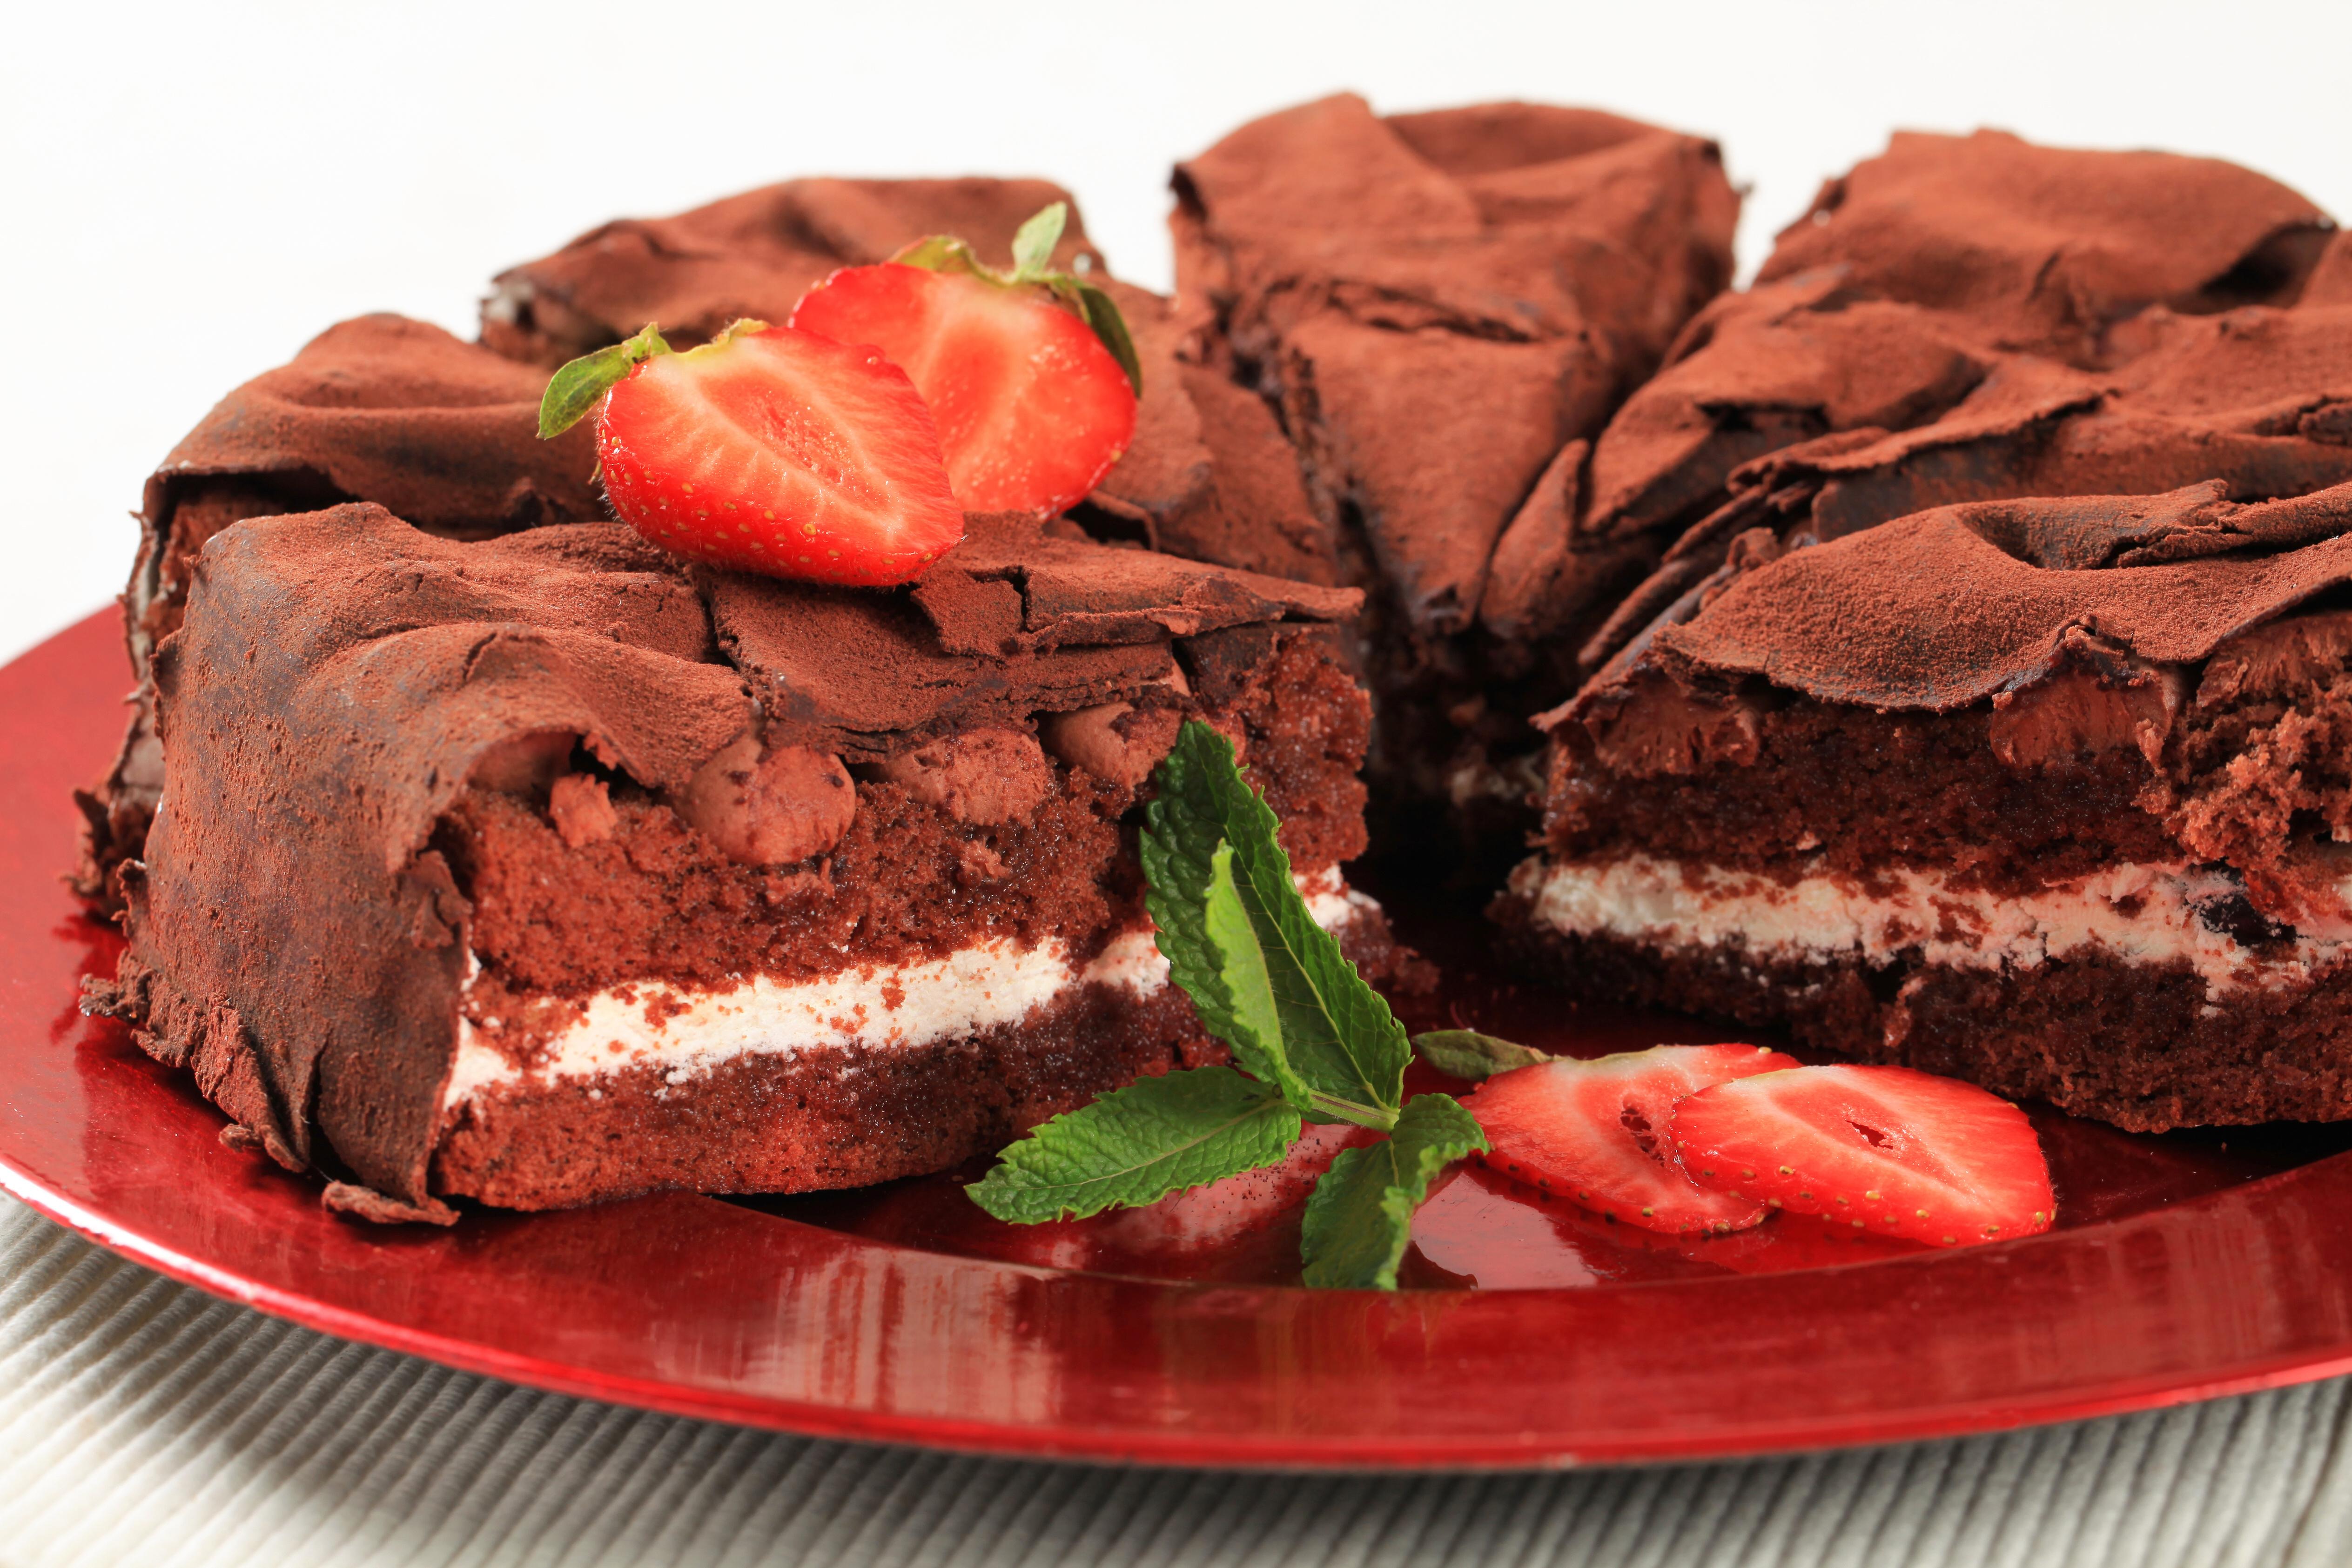 торт пирог  № 1406656 без смс